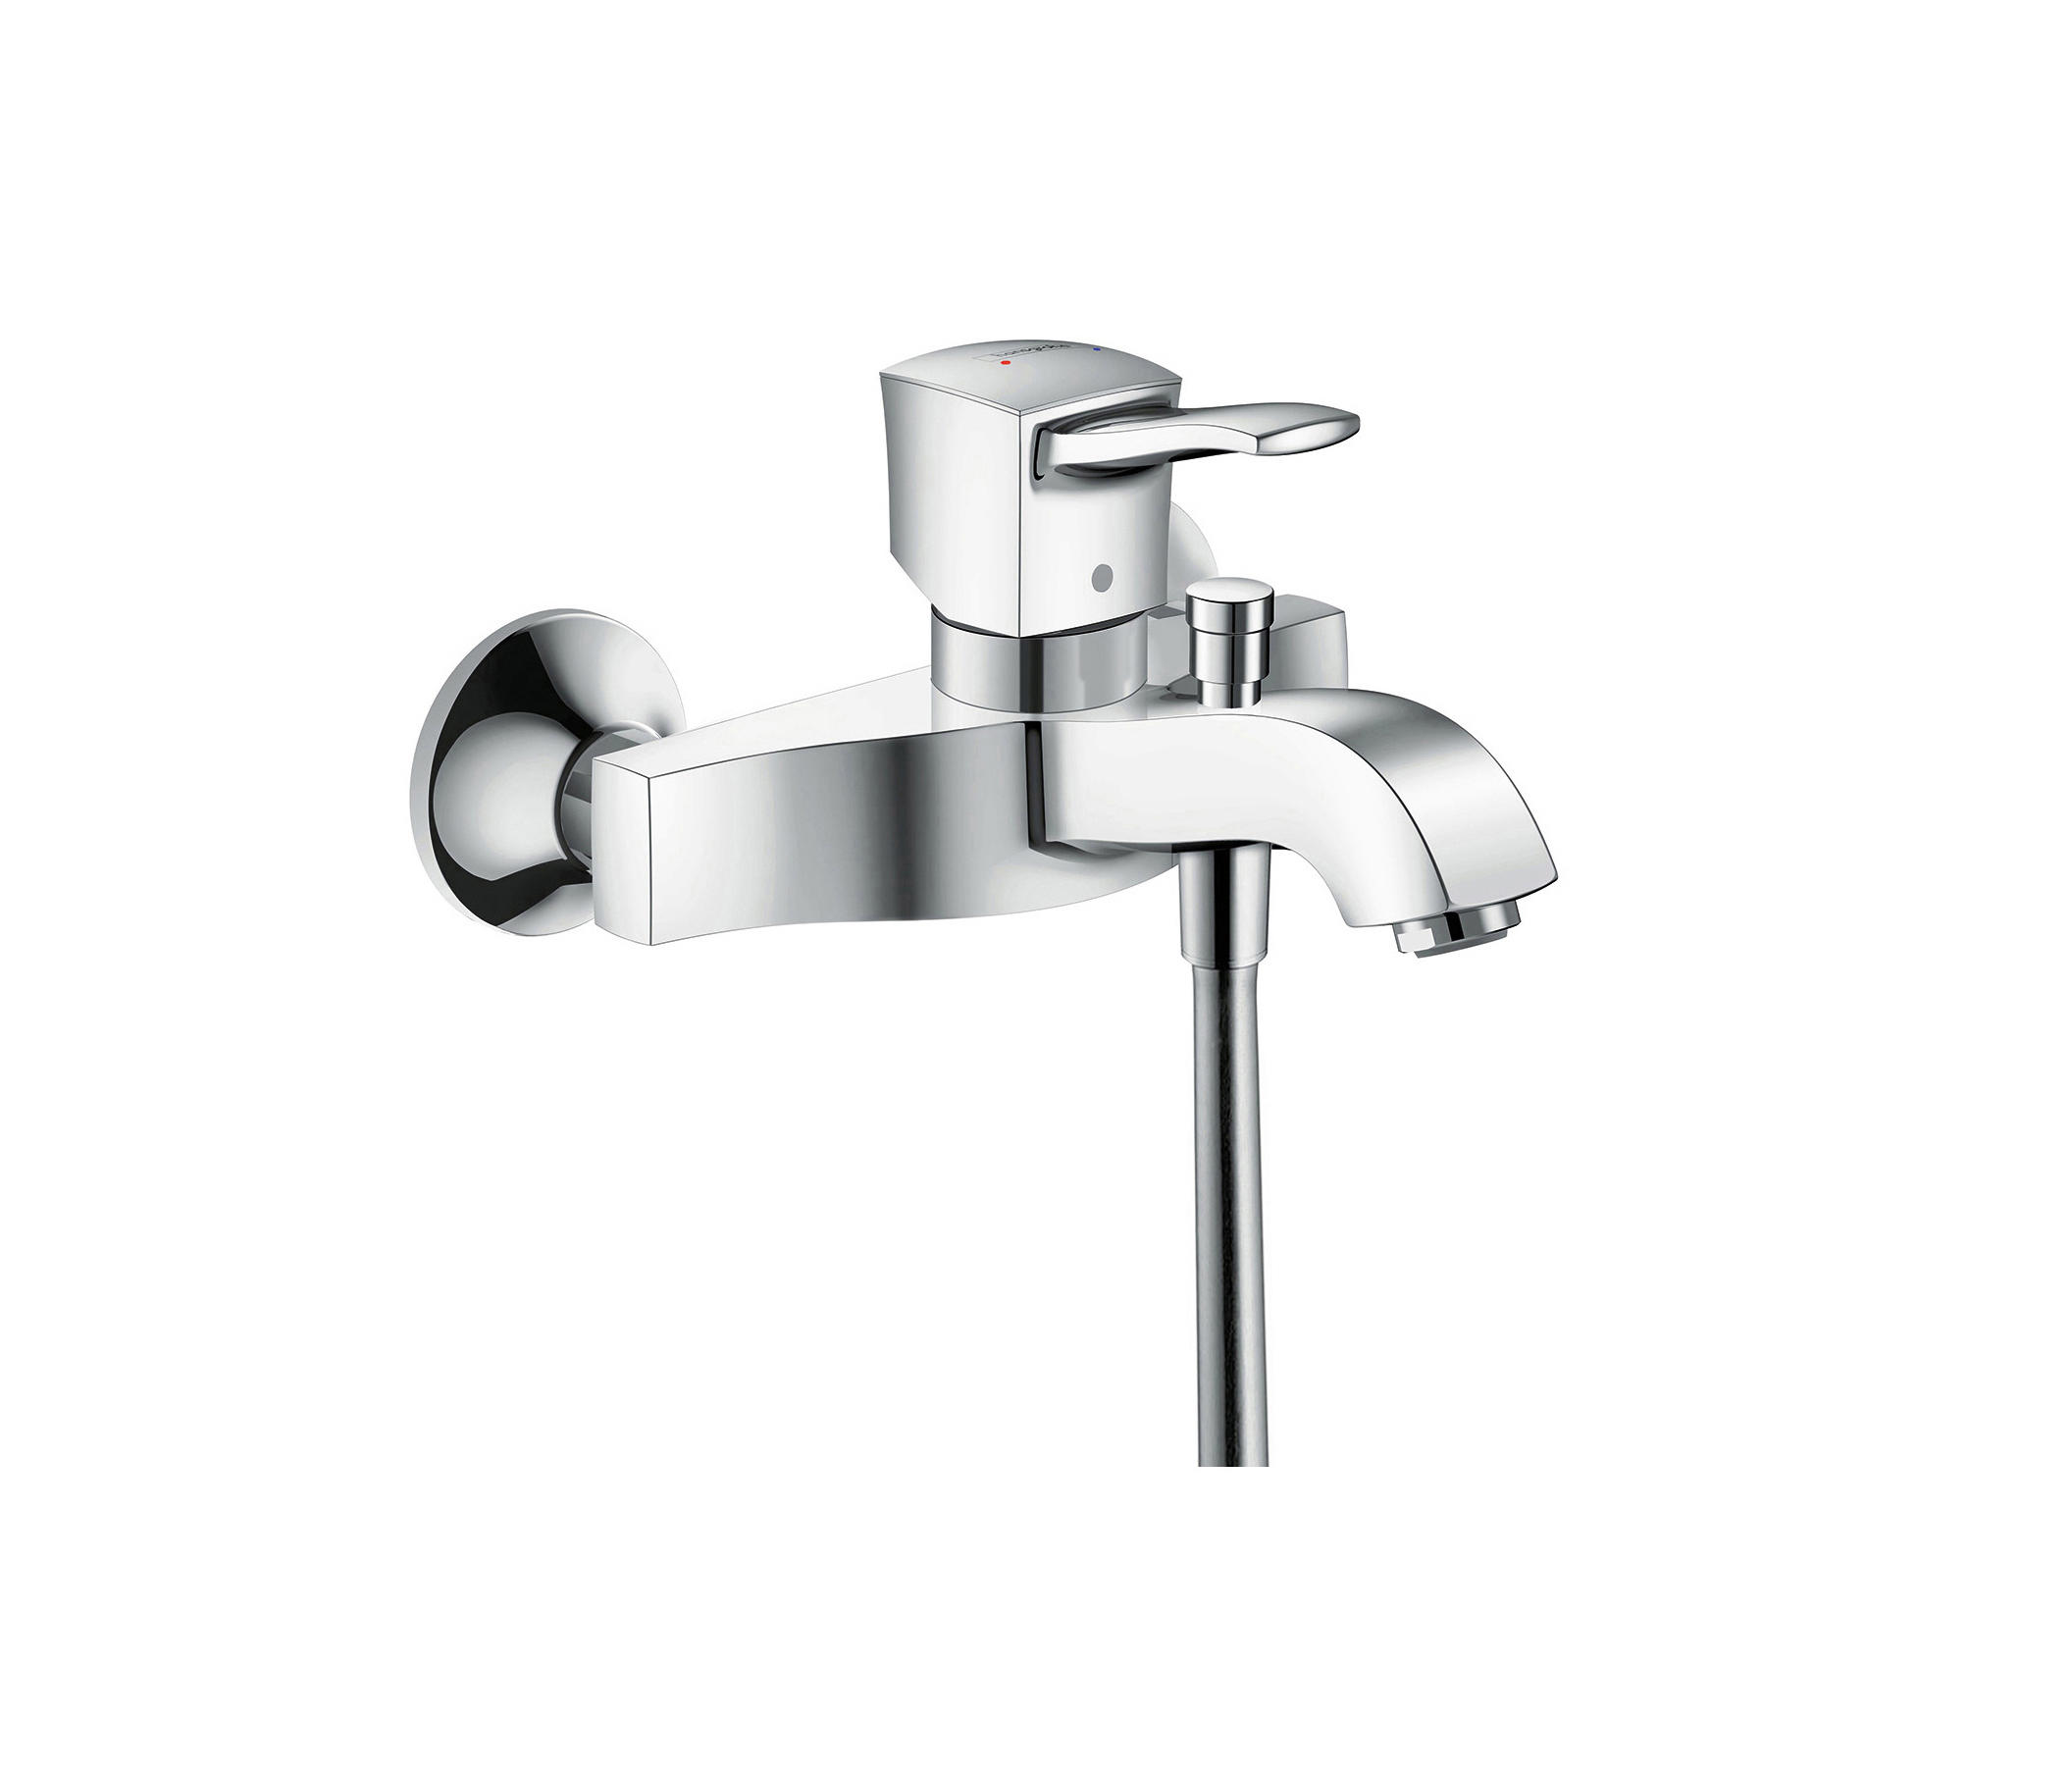 Hansgrohe metropol classic single lever bath mixer for for Hansgrohe metropol